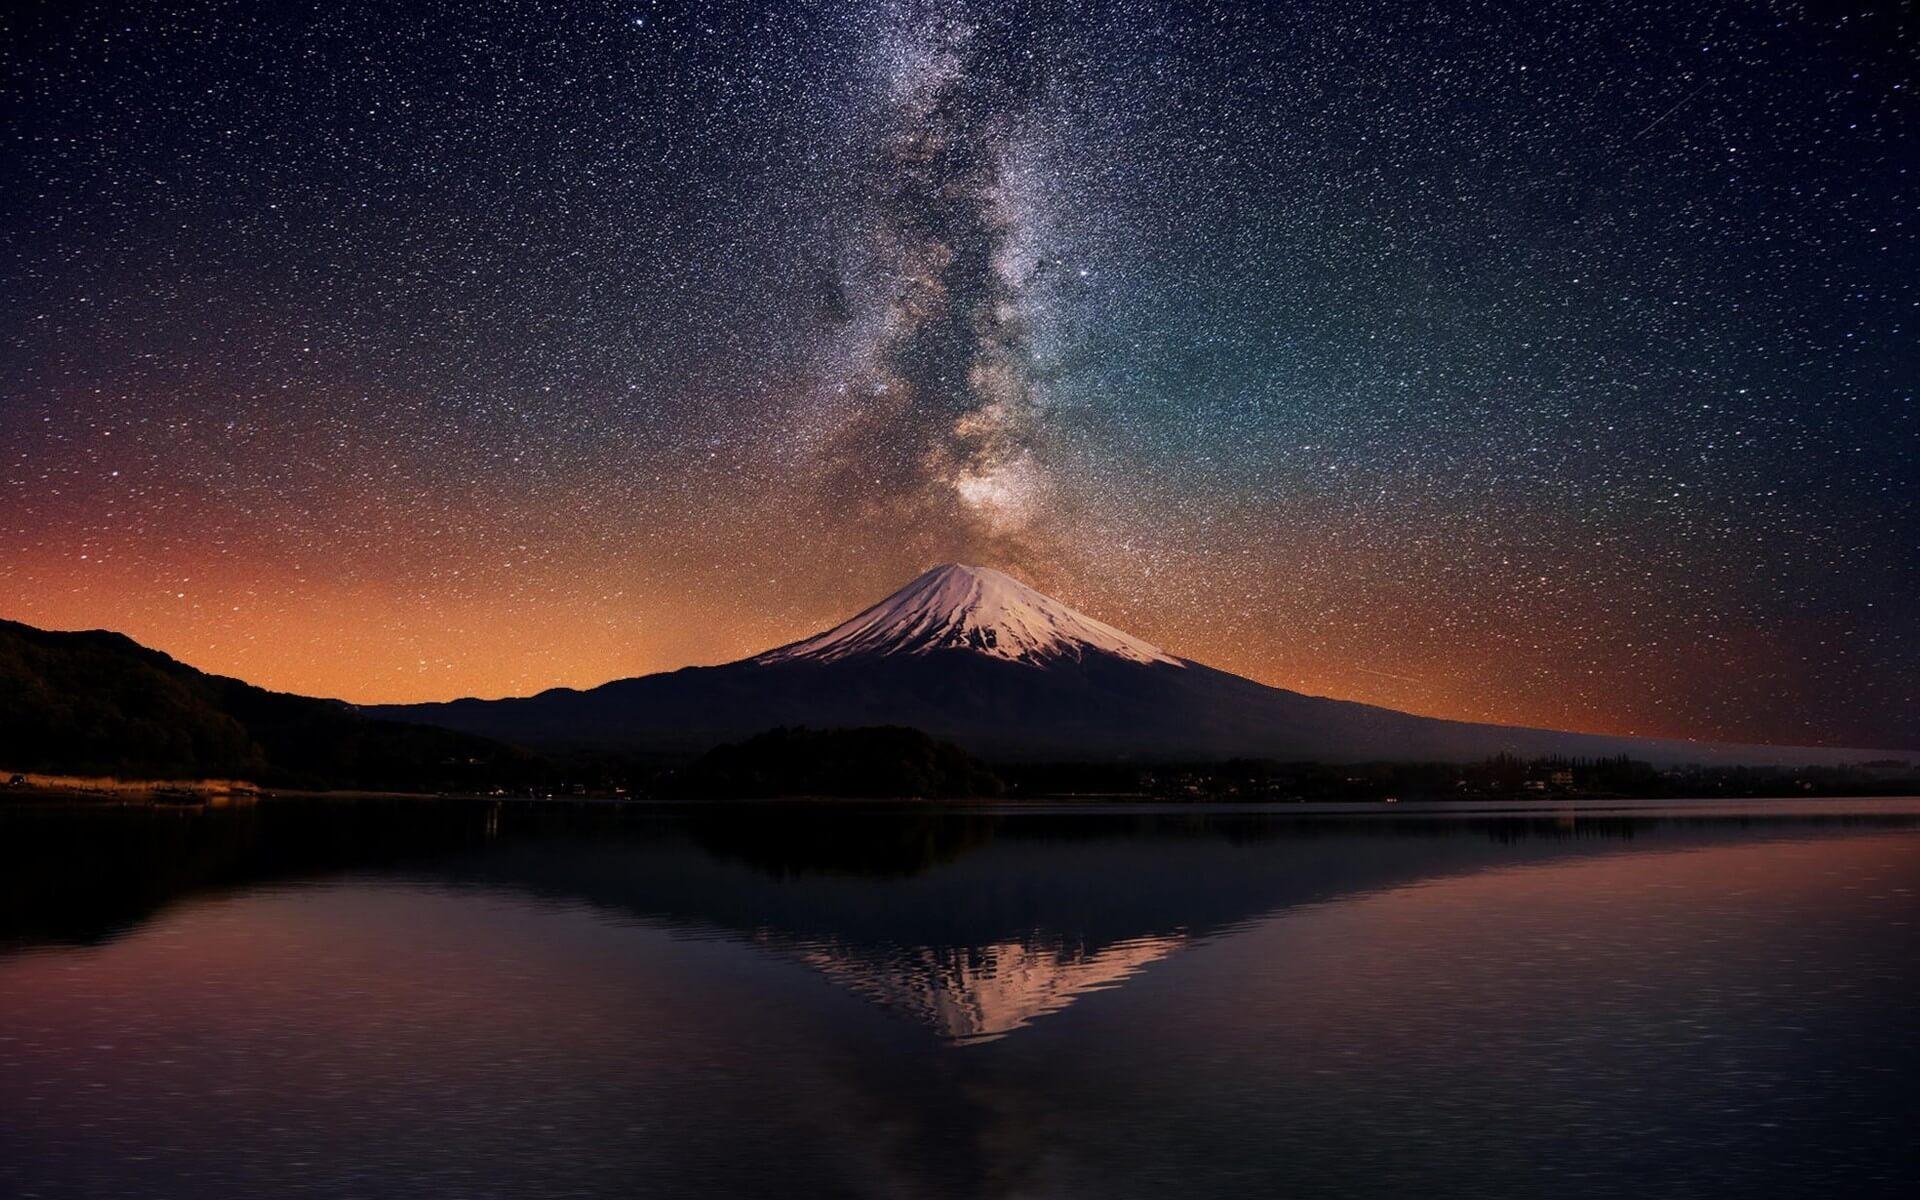 Mount Fuji and stars